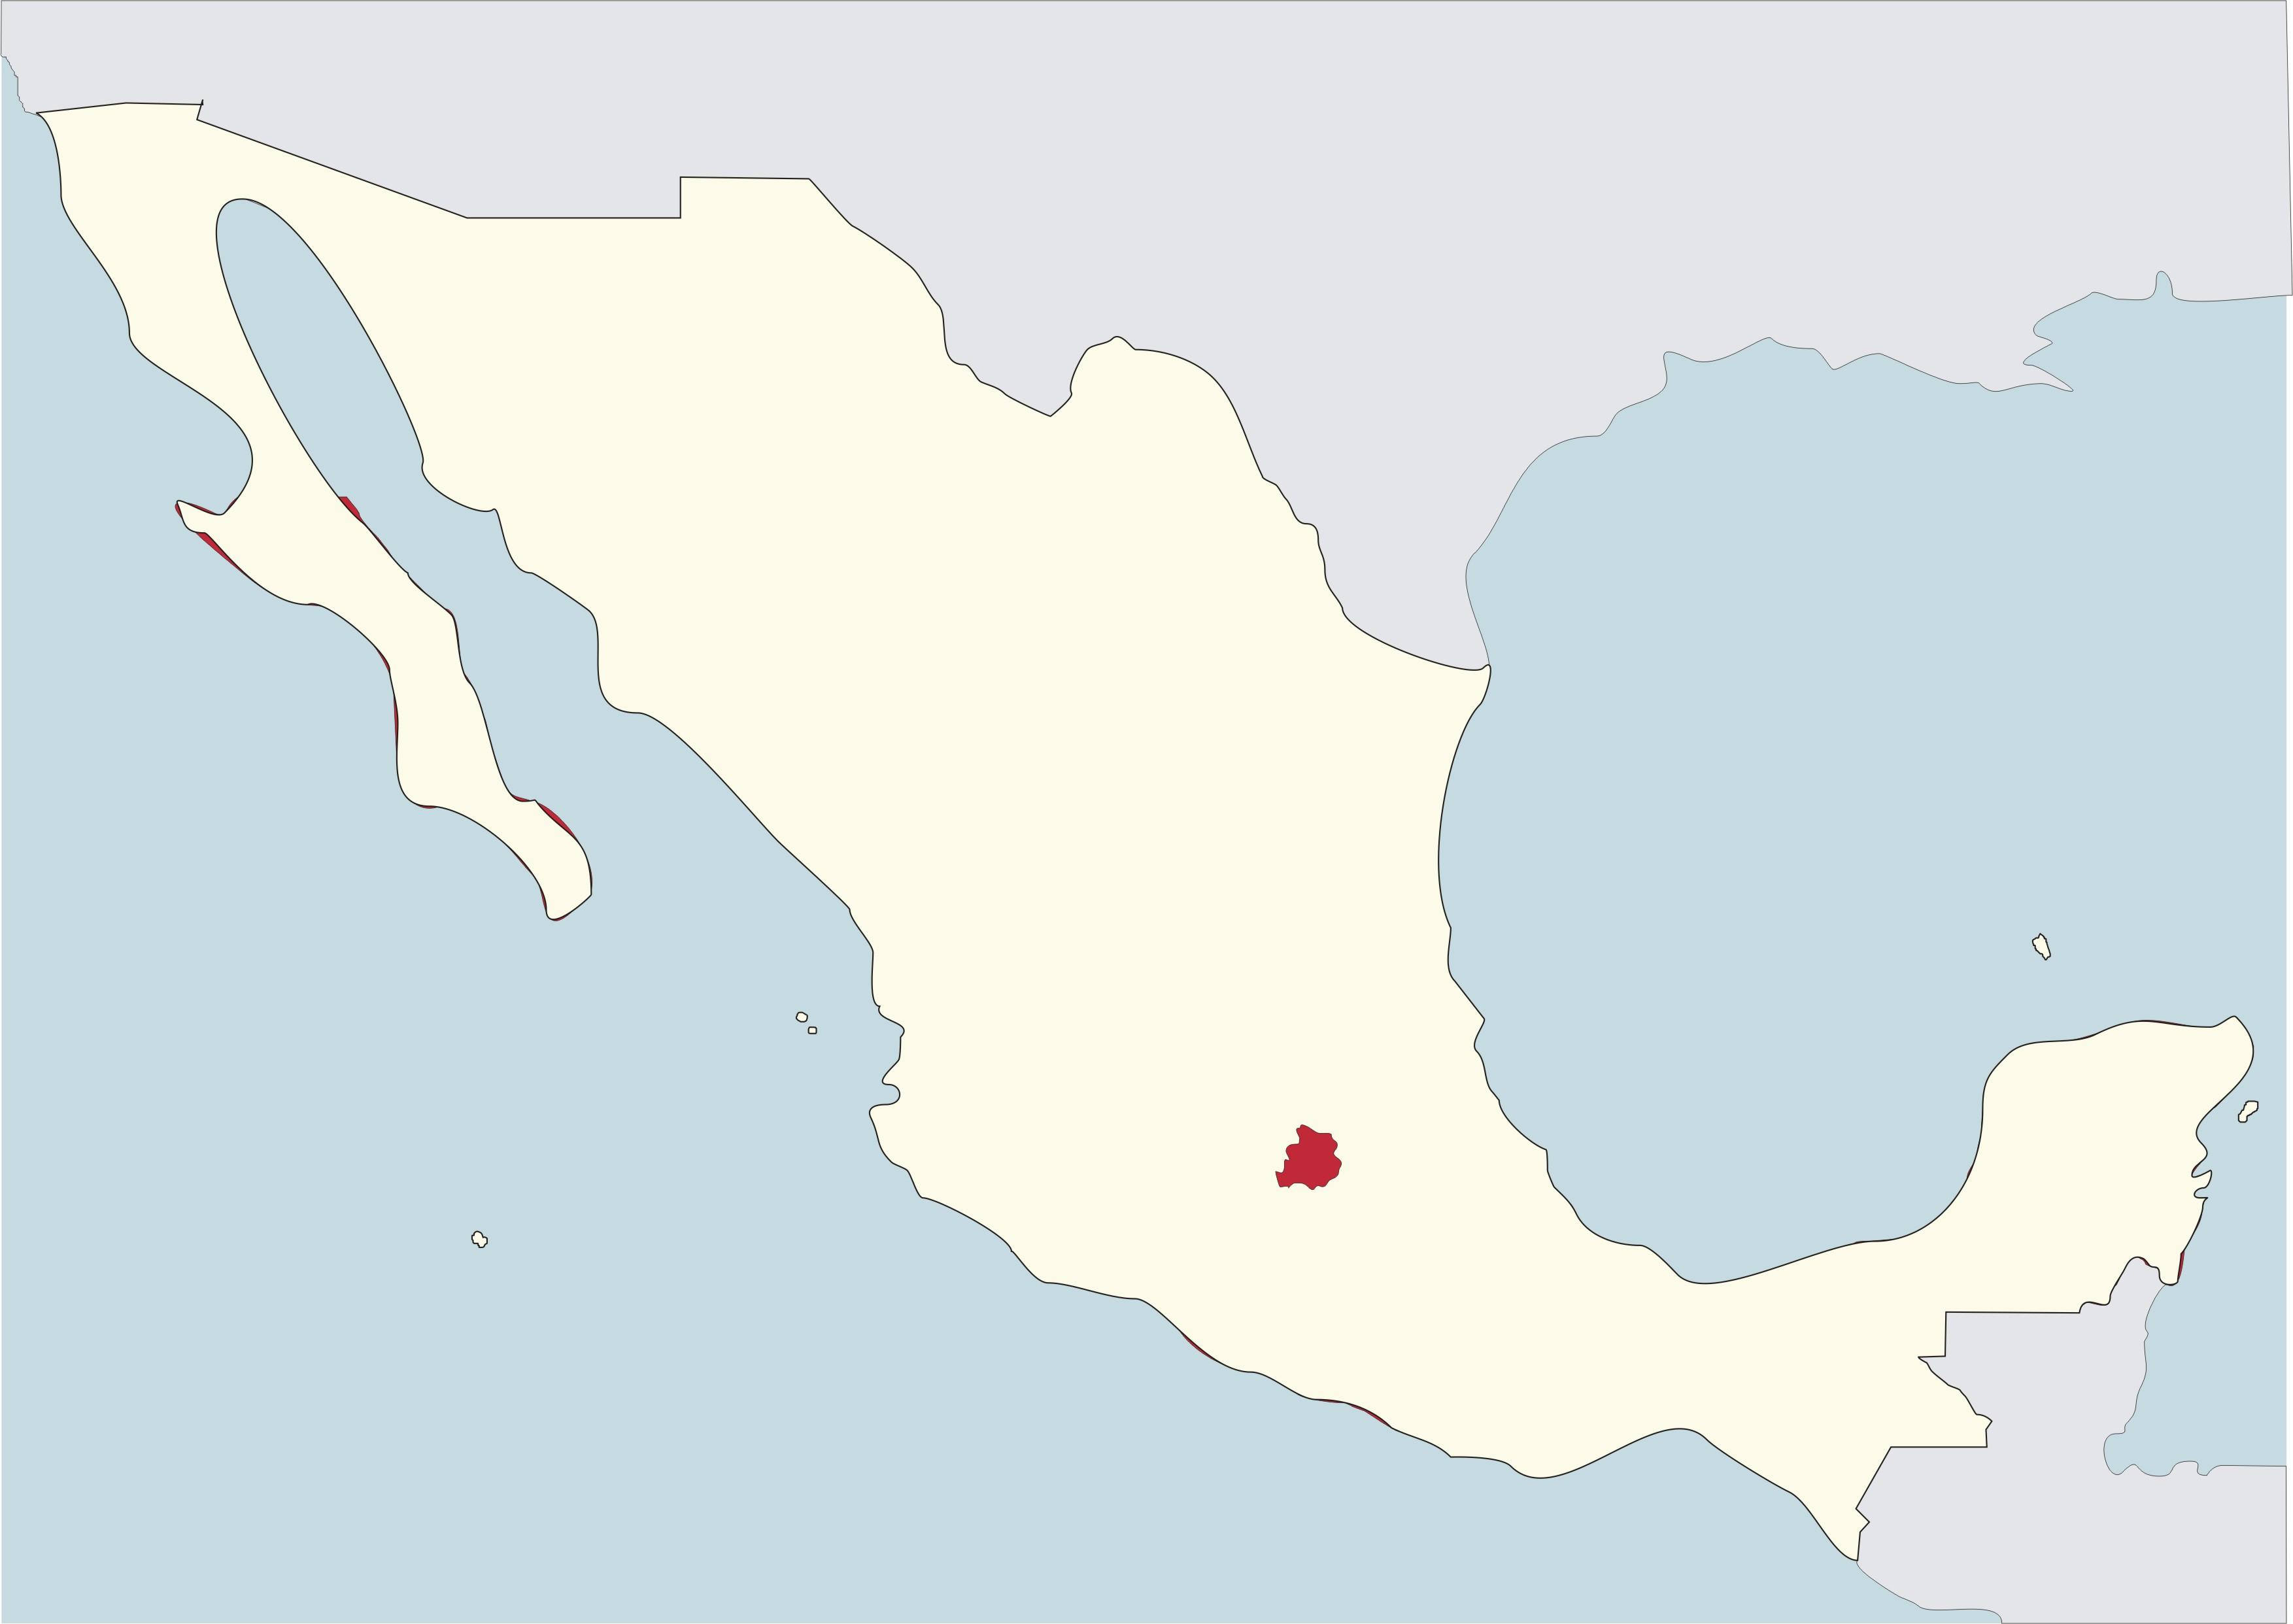 Archivo:Roman Catholic Diocese of Atlacomulco in Mexico.